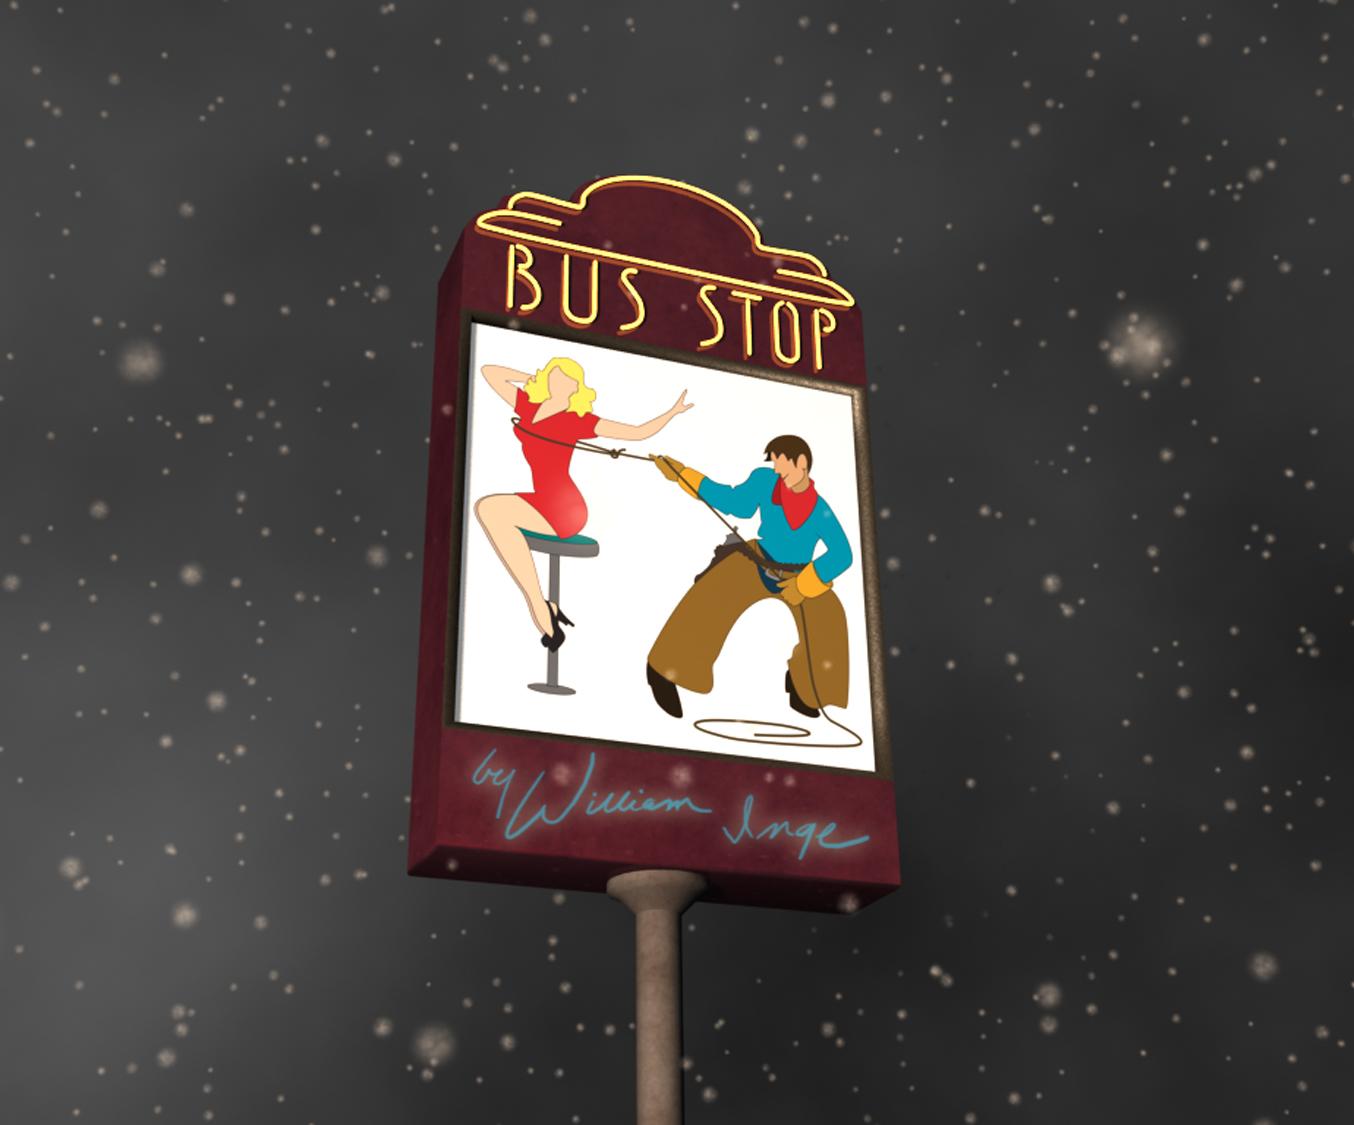 Bus_Stop_sign copy.jpg